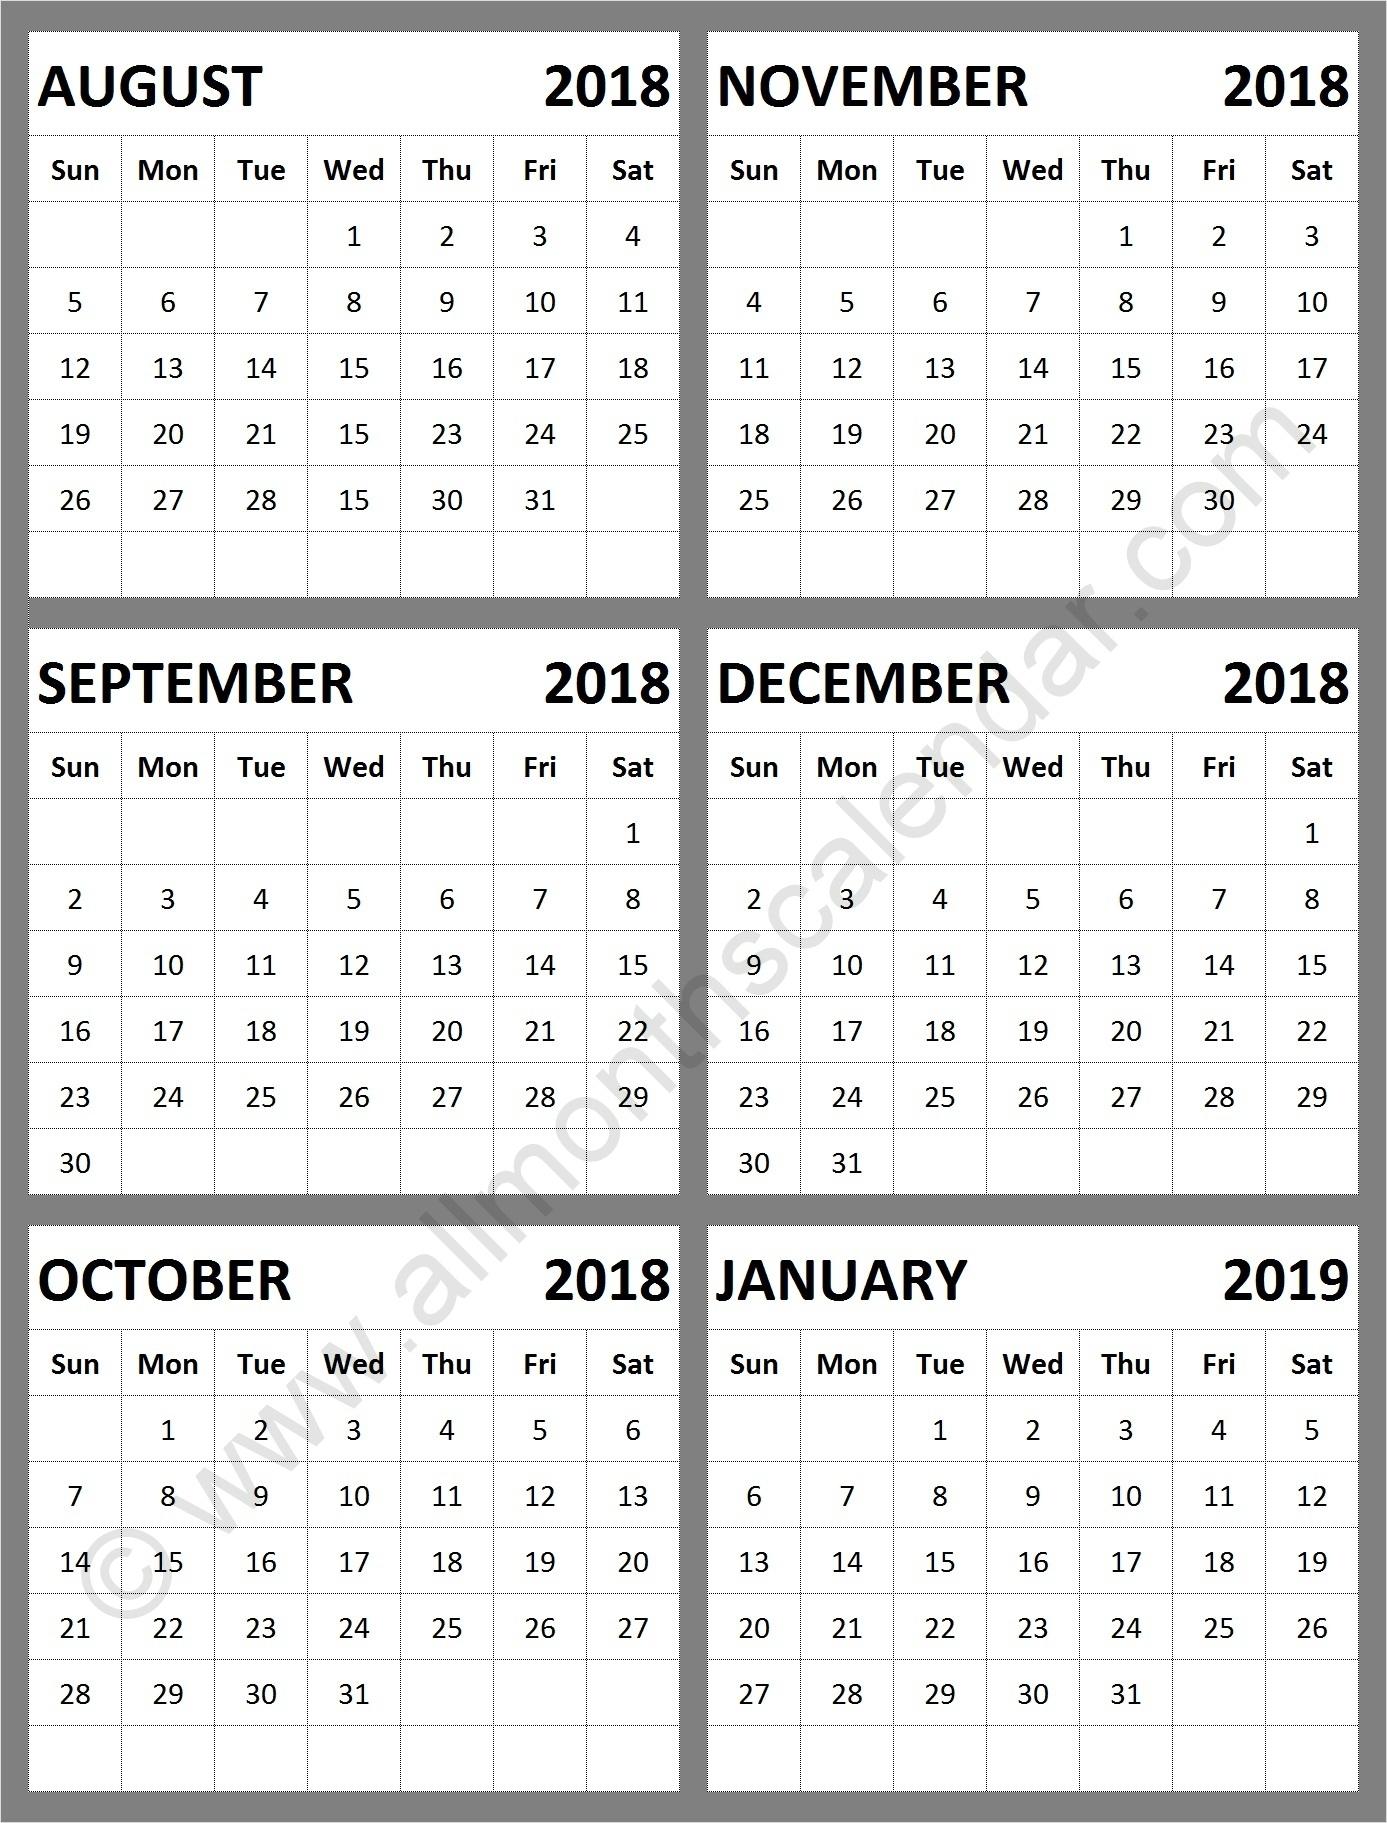 August September October November December 2018 January 2019 Calendar with Calander From August - December